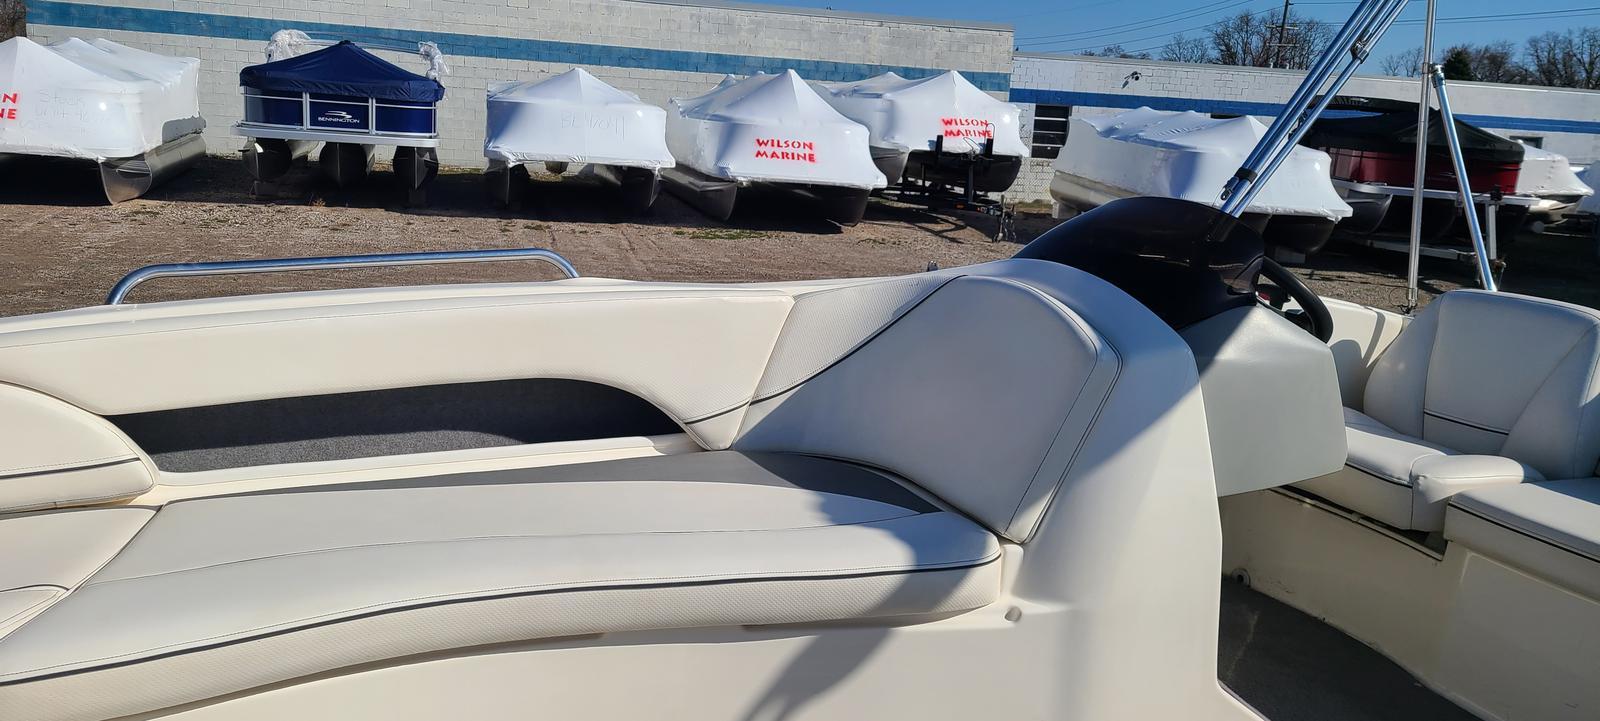 2009 Bayliner boat for sale, model of the boat is 197 & Image # 3 of 6